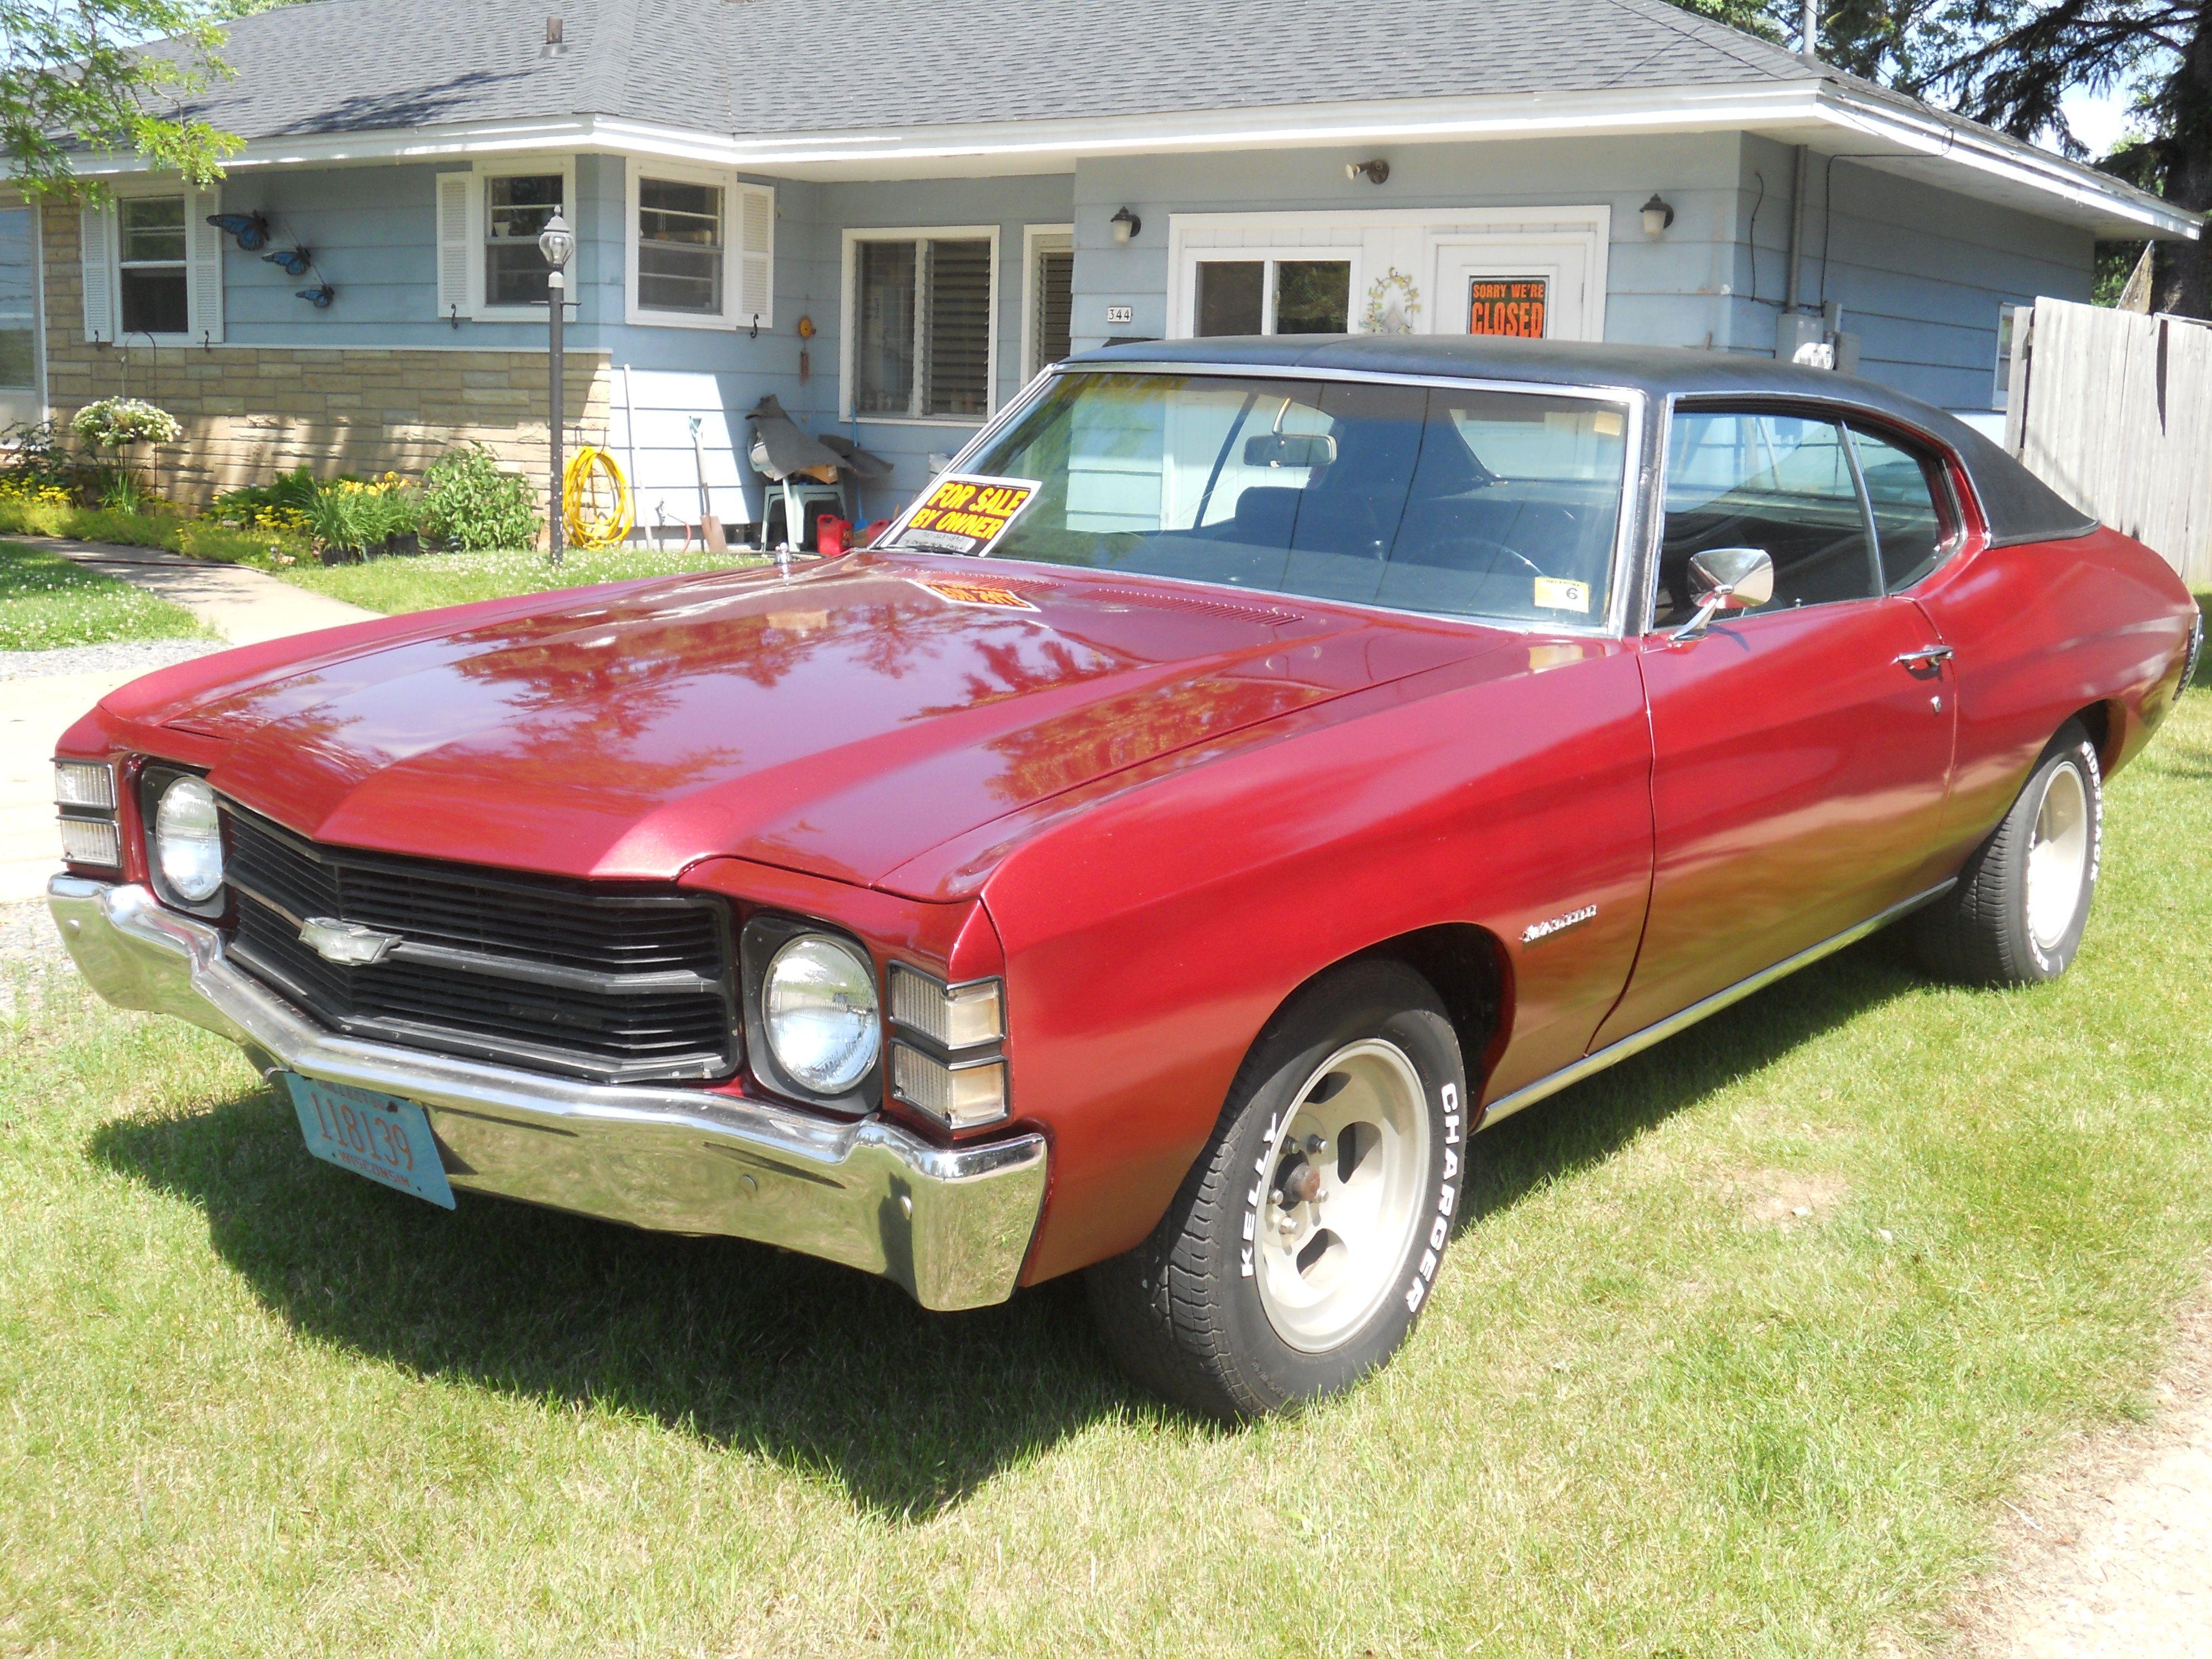 True American Muscle, 1971 Chevelle Malibu | Car love | Pinterest ...